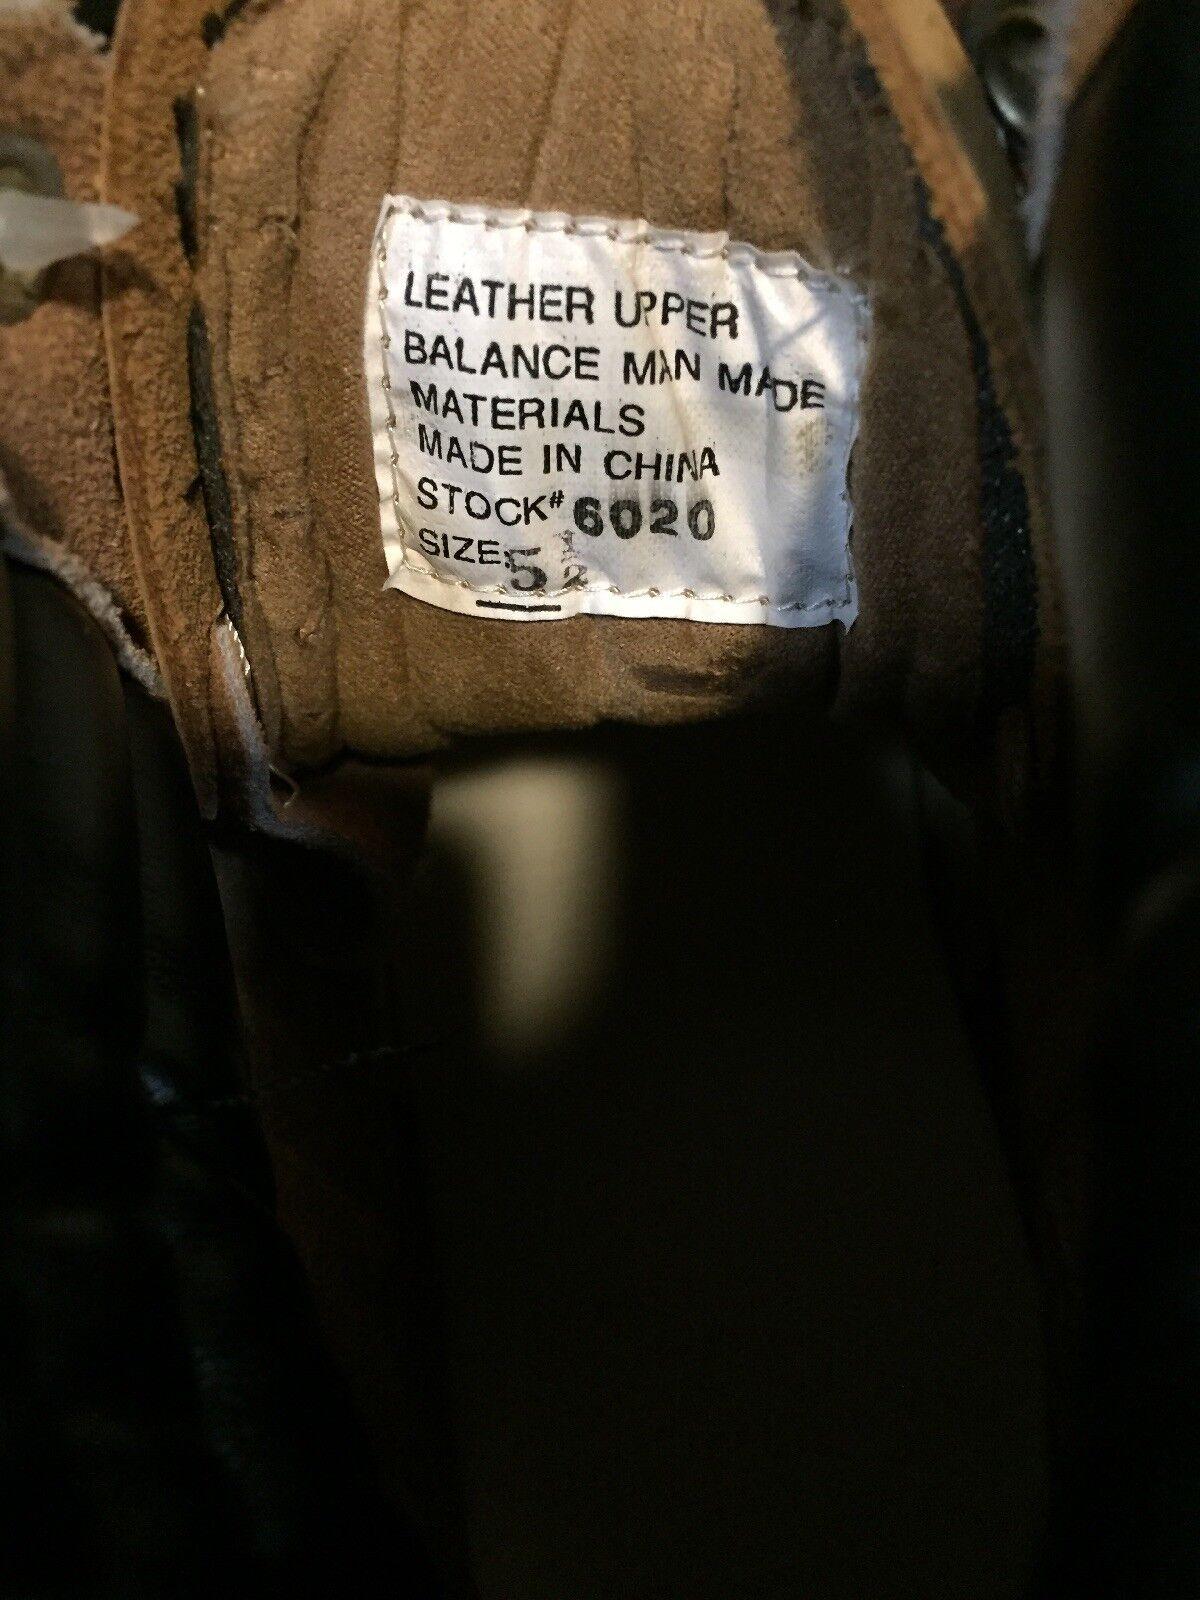 Grande Hunter Resistant Uomo's Work Stivali Size 5.5 Insulated Oil Resistant Hunter Safety Stivali d6a3bd